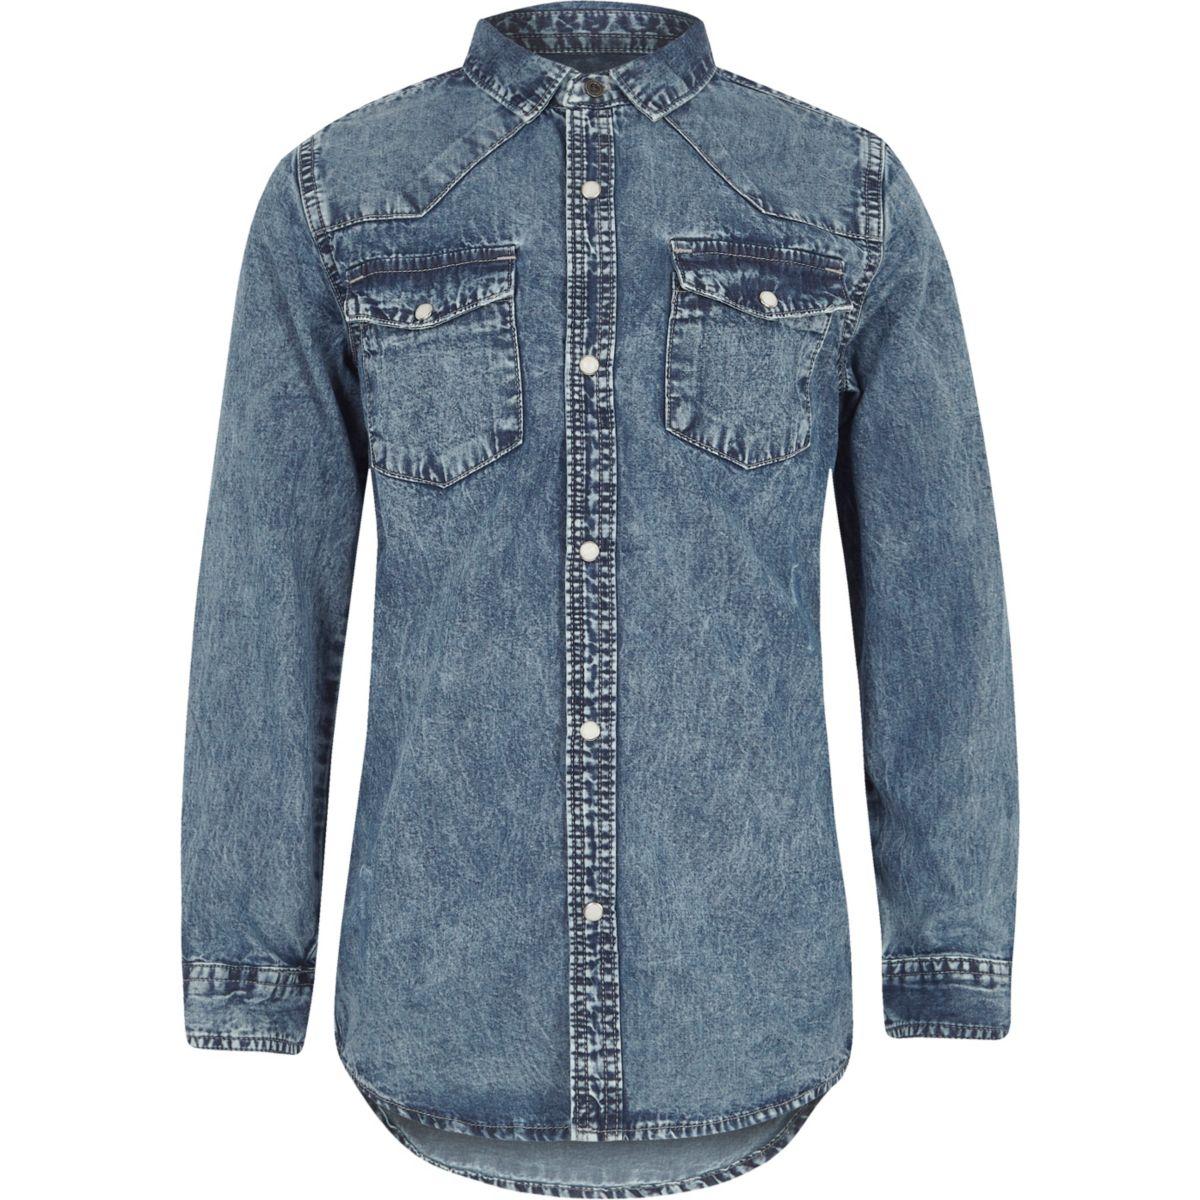 Boys blue acid wash denim long sleeve shirt